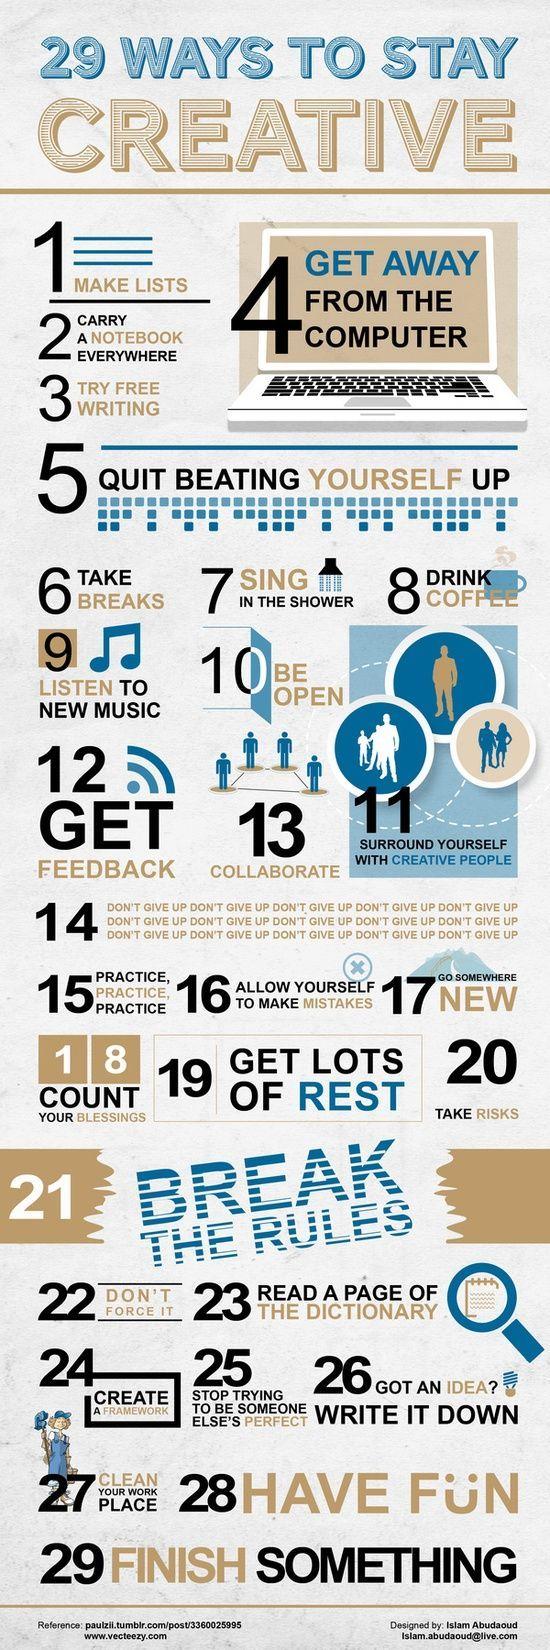 29 Ways to Stay #Creative - via @FancyHands #Career #SocialMedia